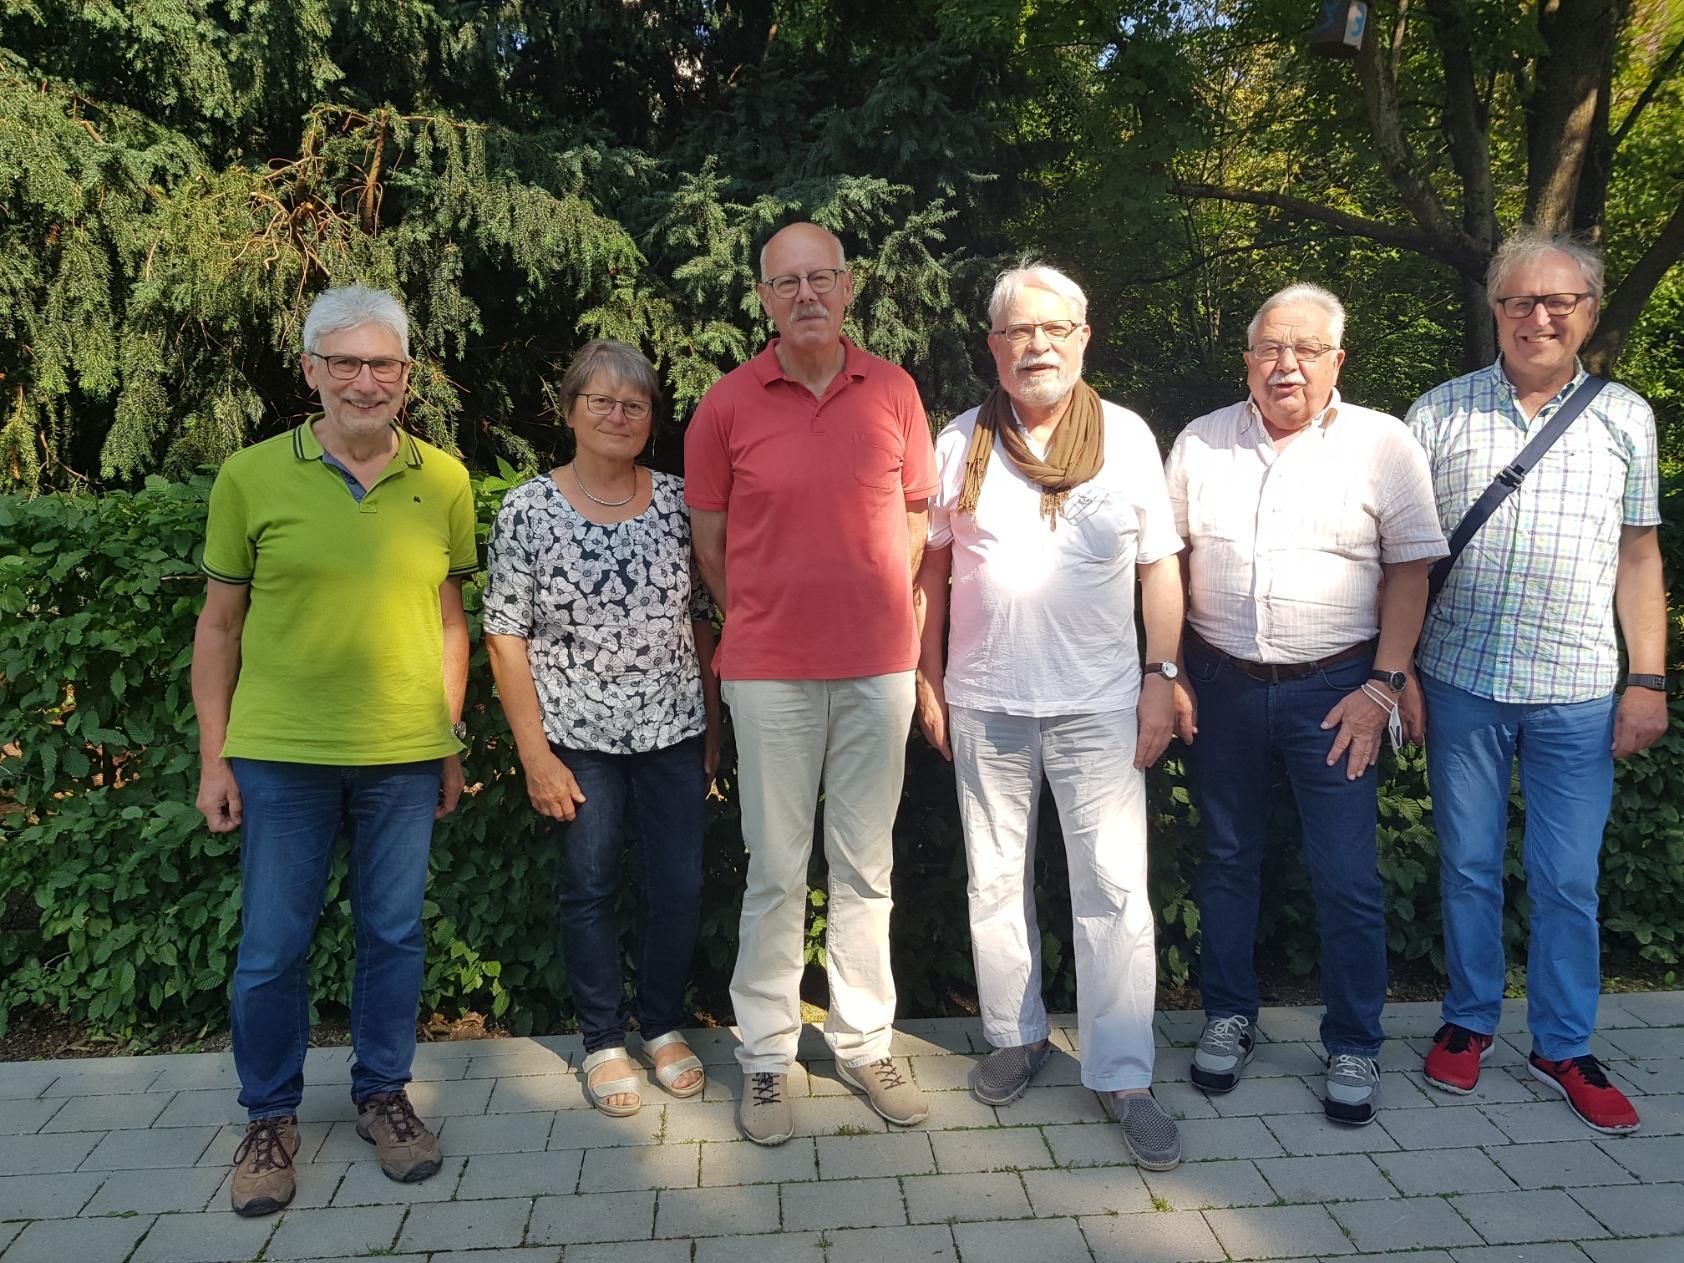 Vorstand Seniorenrat Kernen 2021: v.l. M. Lassak, S. Lassak, P. Oelkrug, U.Lang, O. Förstner, R. Urbanke (es fehlen mI. fink und J. Muth)